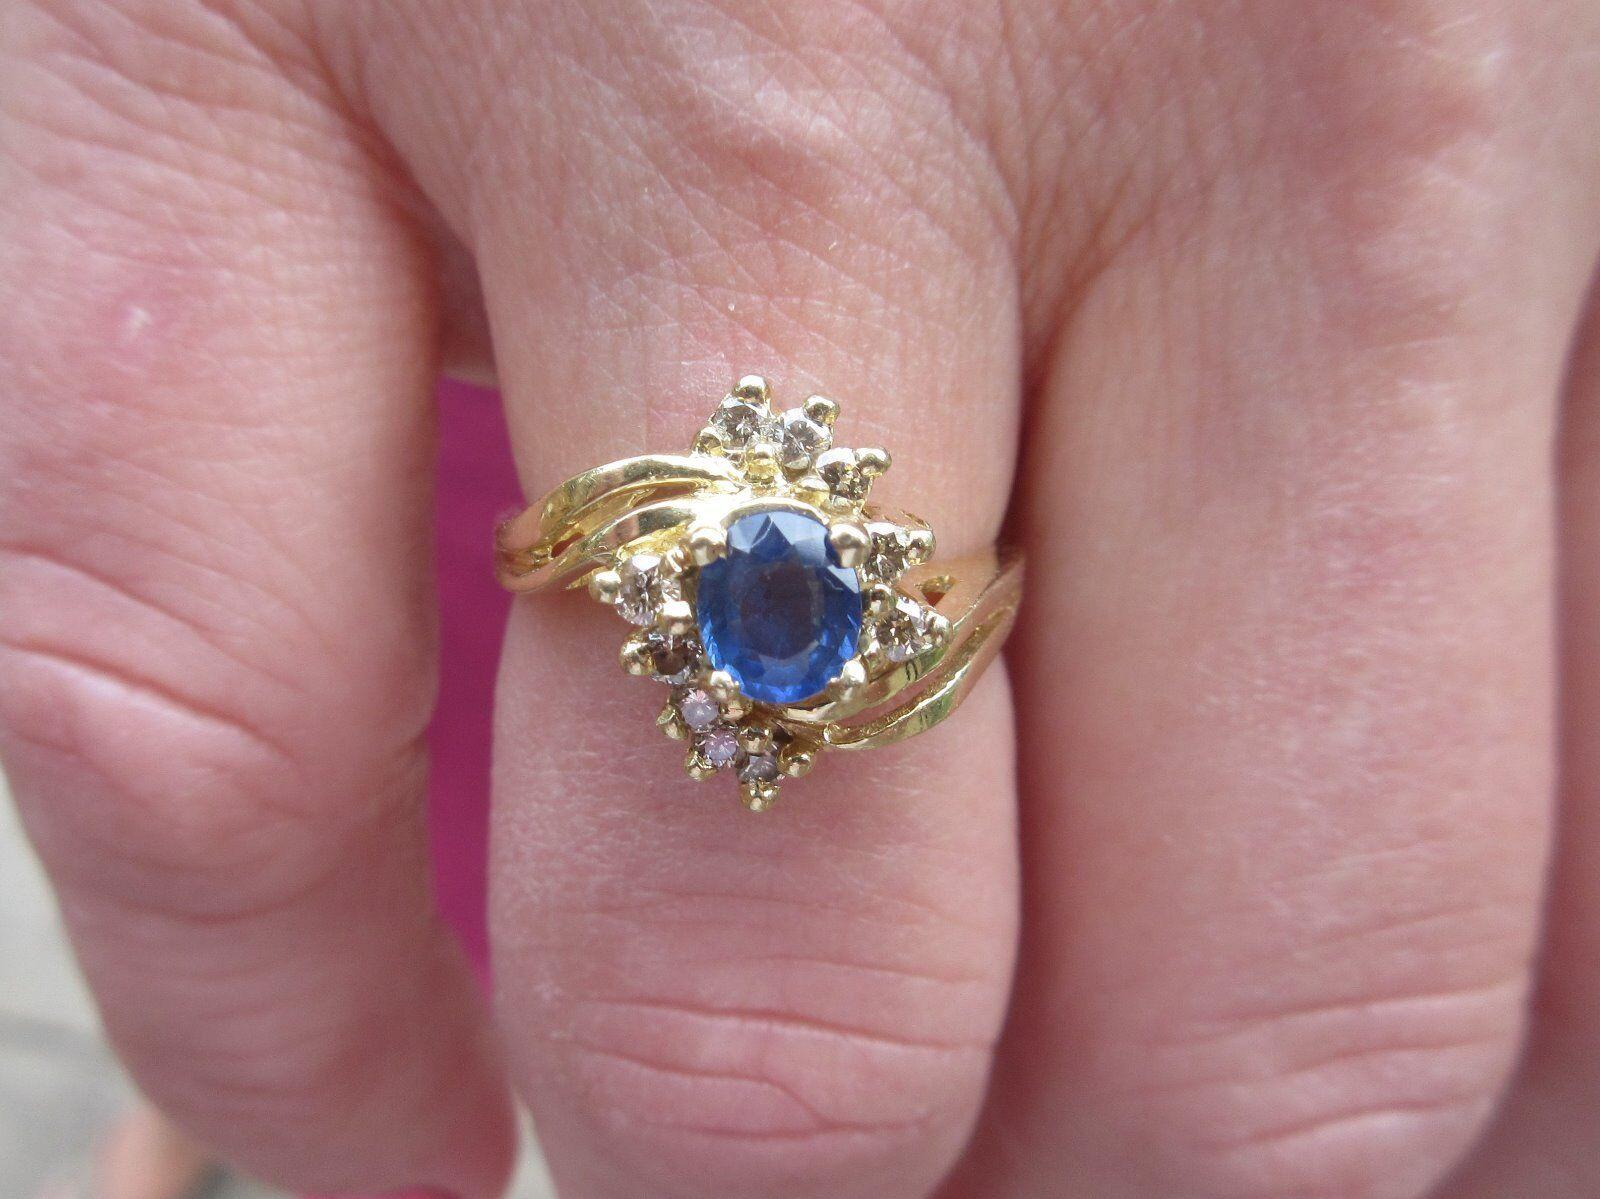 14 KT Sapphire and Diamond Ring - .65 Sapphire and .35 Diamond CTW